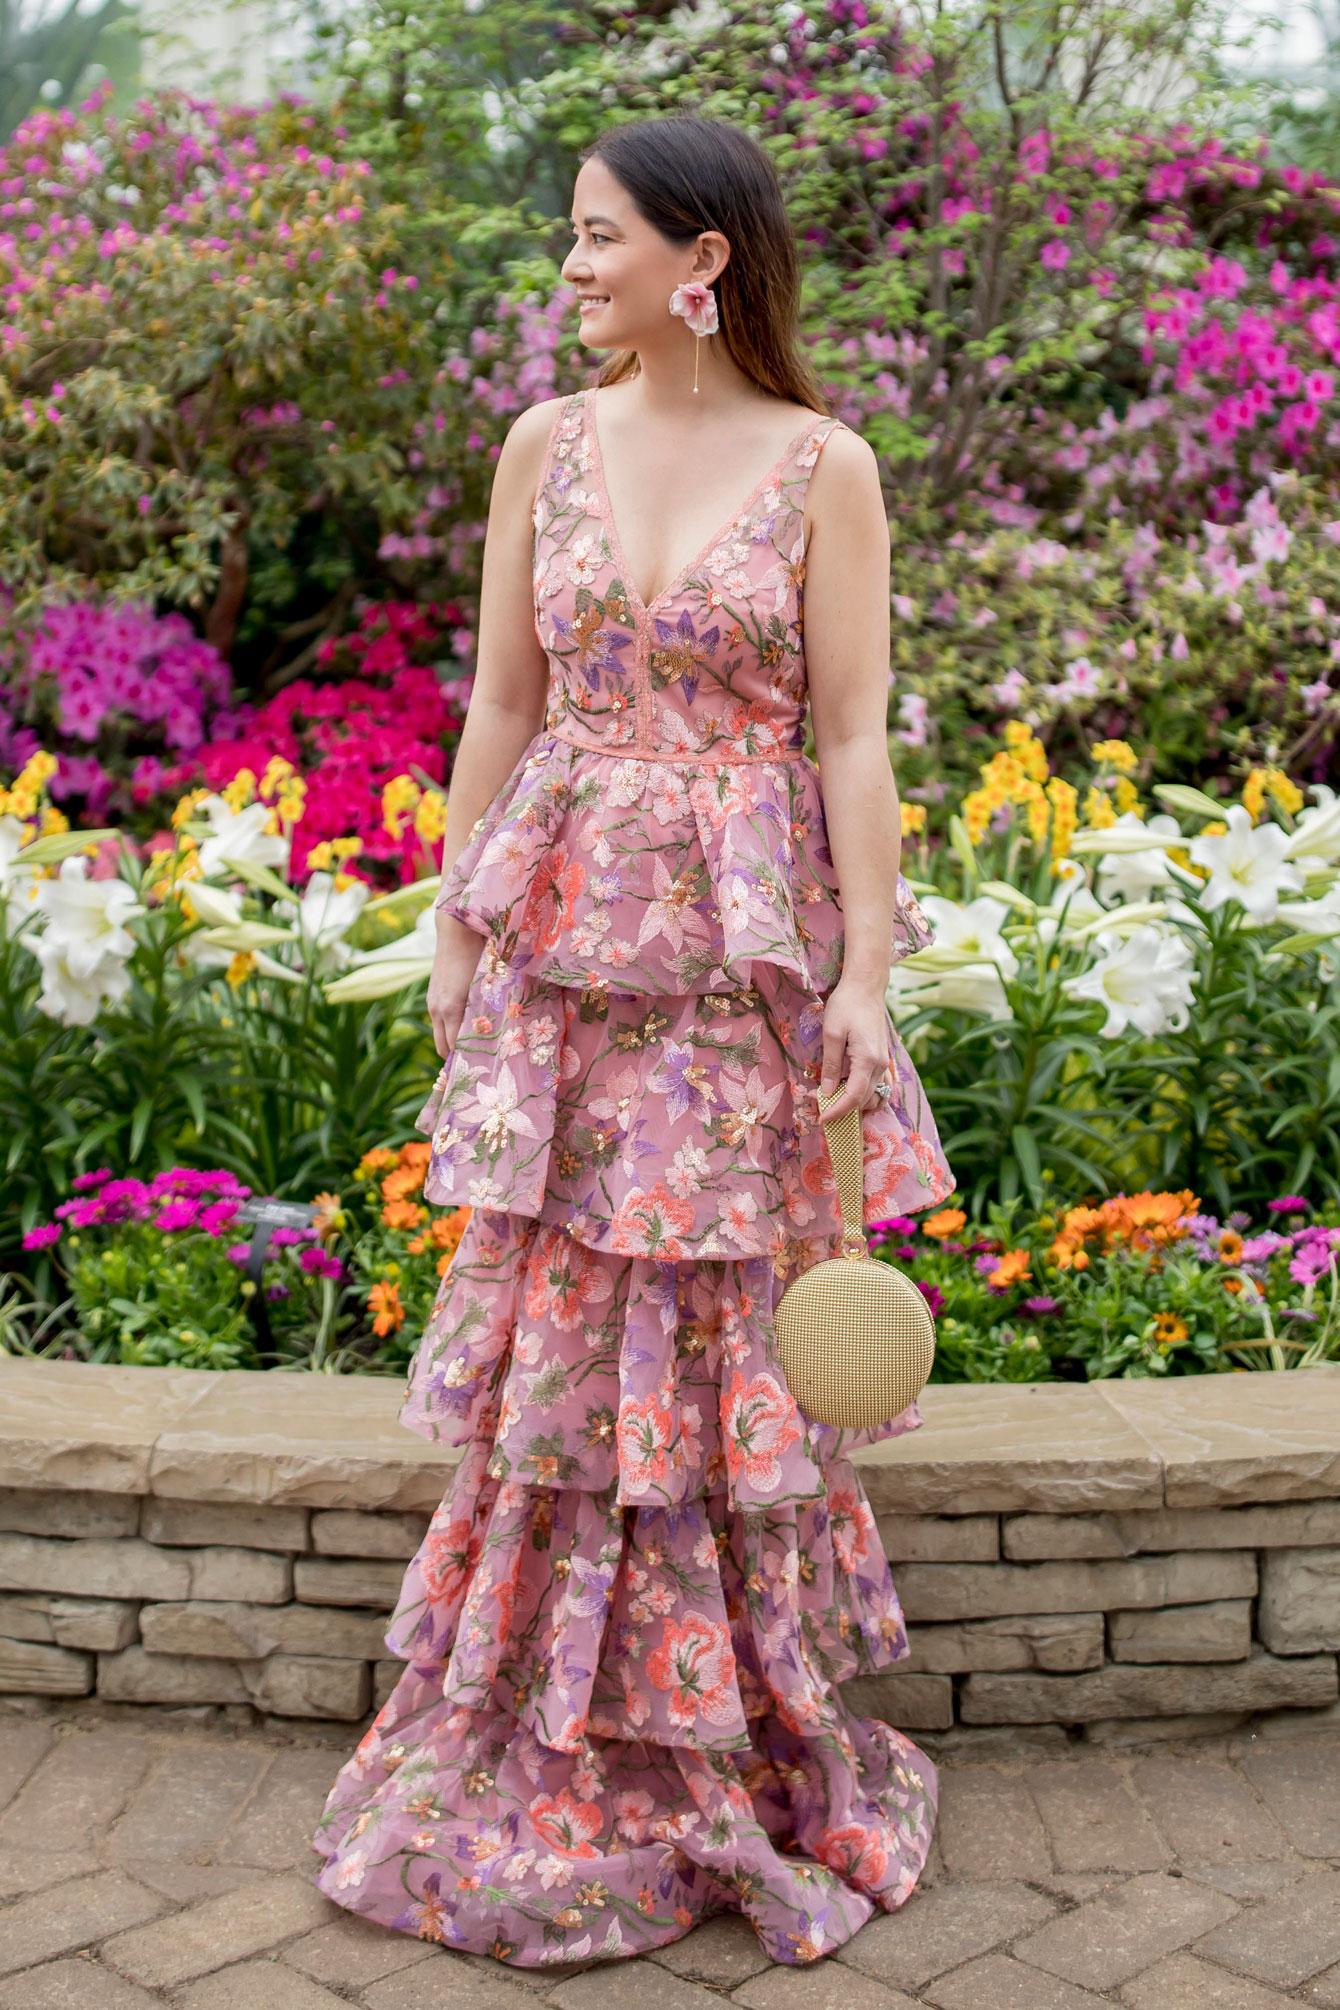 Jennifer Lake BHLDN Blush Embellished Tiered Gown